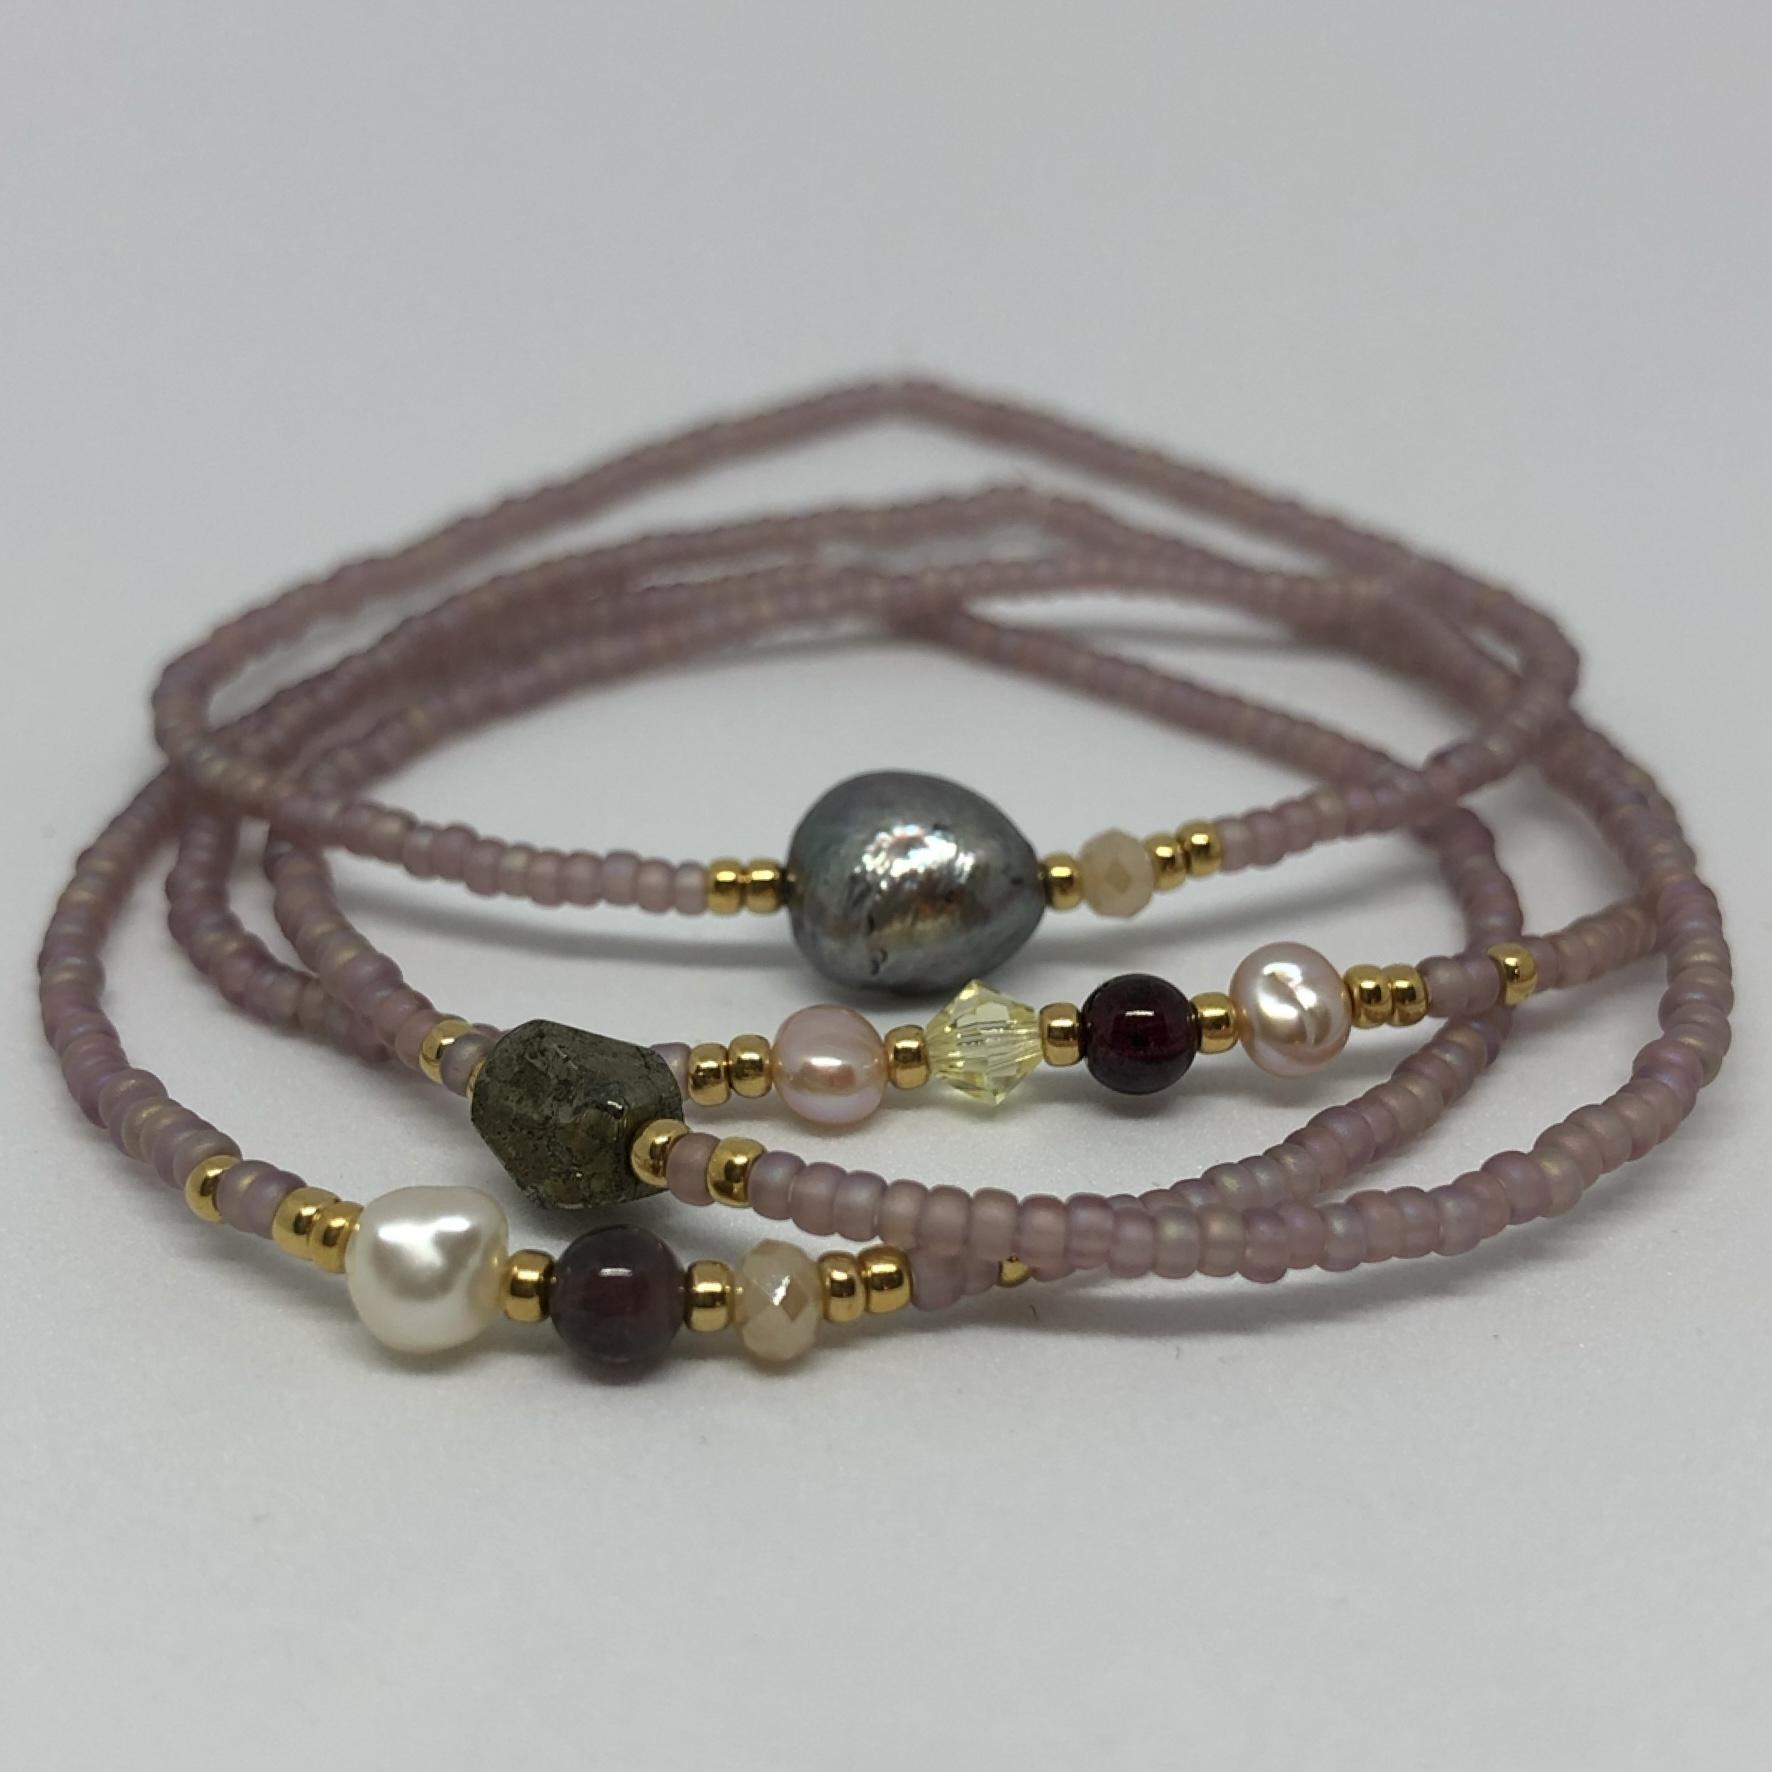 Miyuki - Seed beads - Delicas - Mini perler